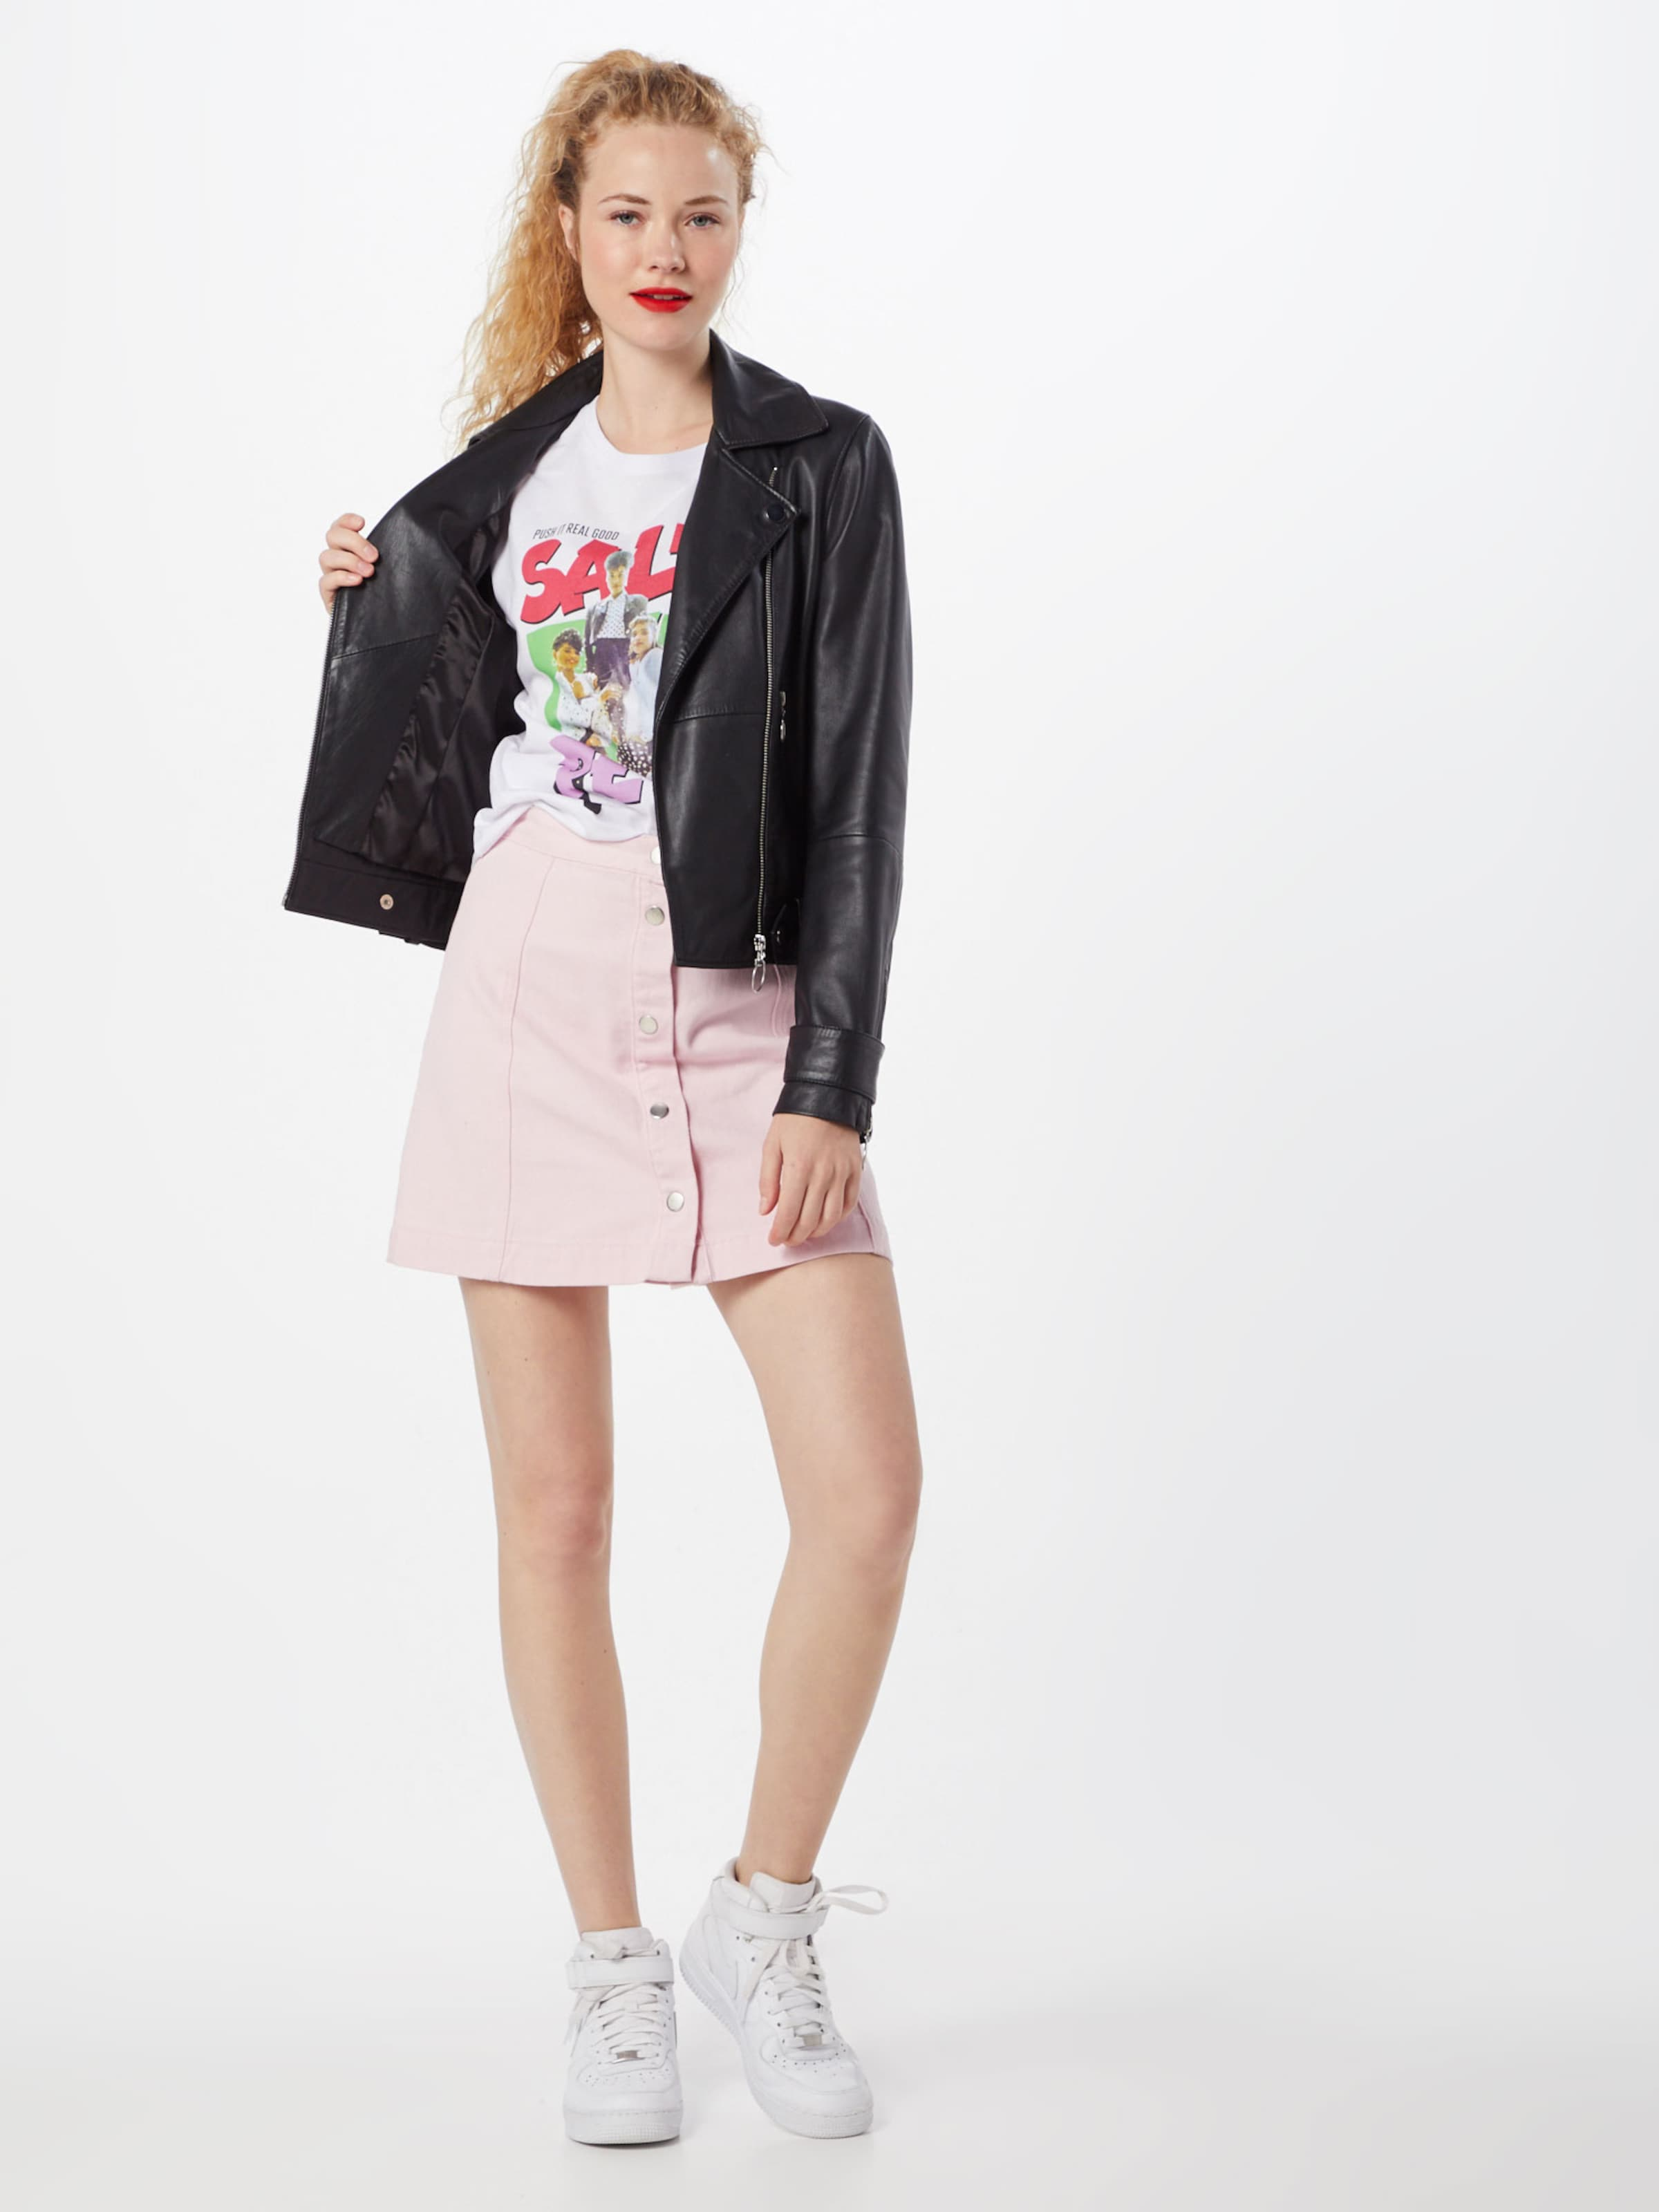 Merchcode N ClairViolet Salt Pepa T Tee' Blanc En 'ladies Rose shirt Vert srxhdCtQ